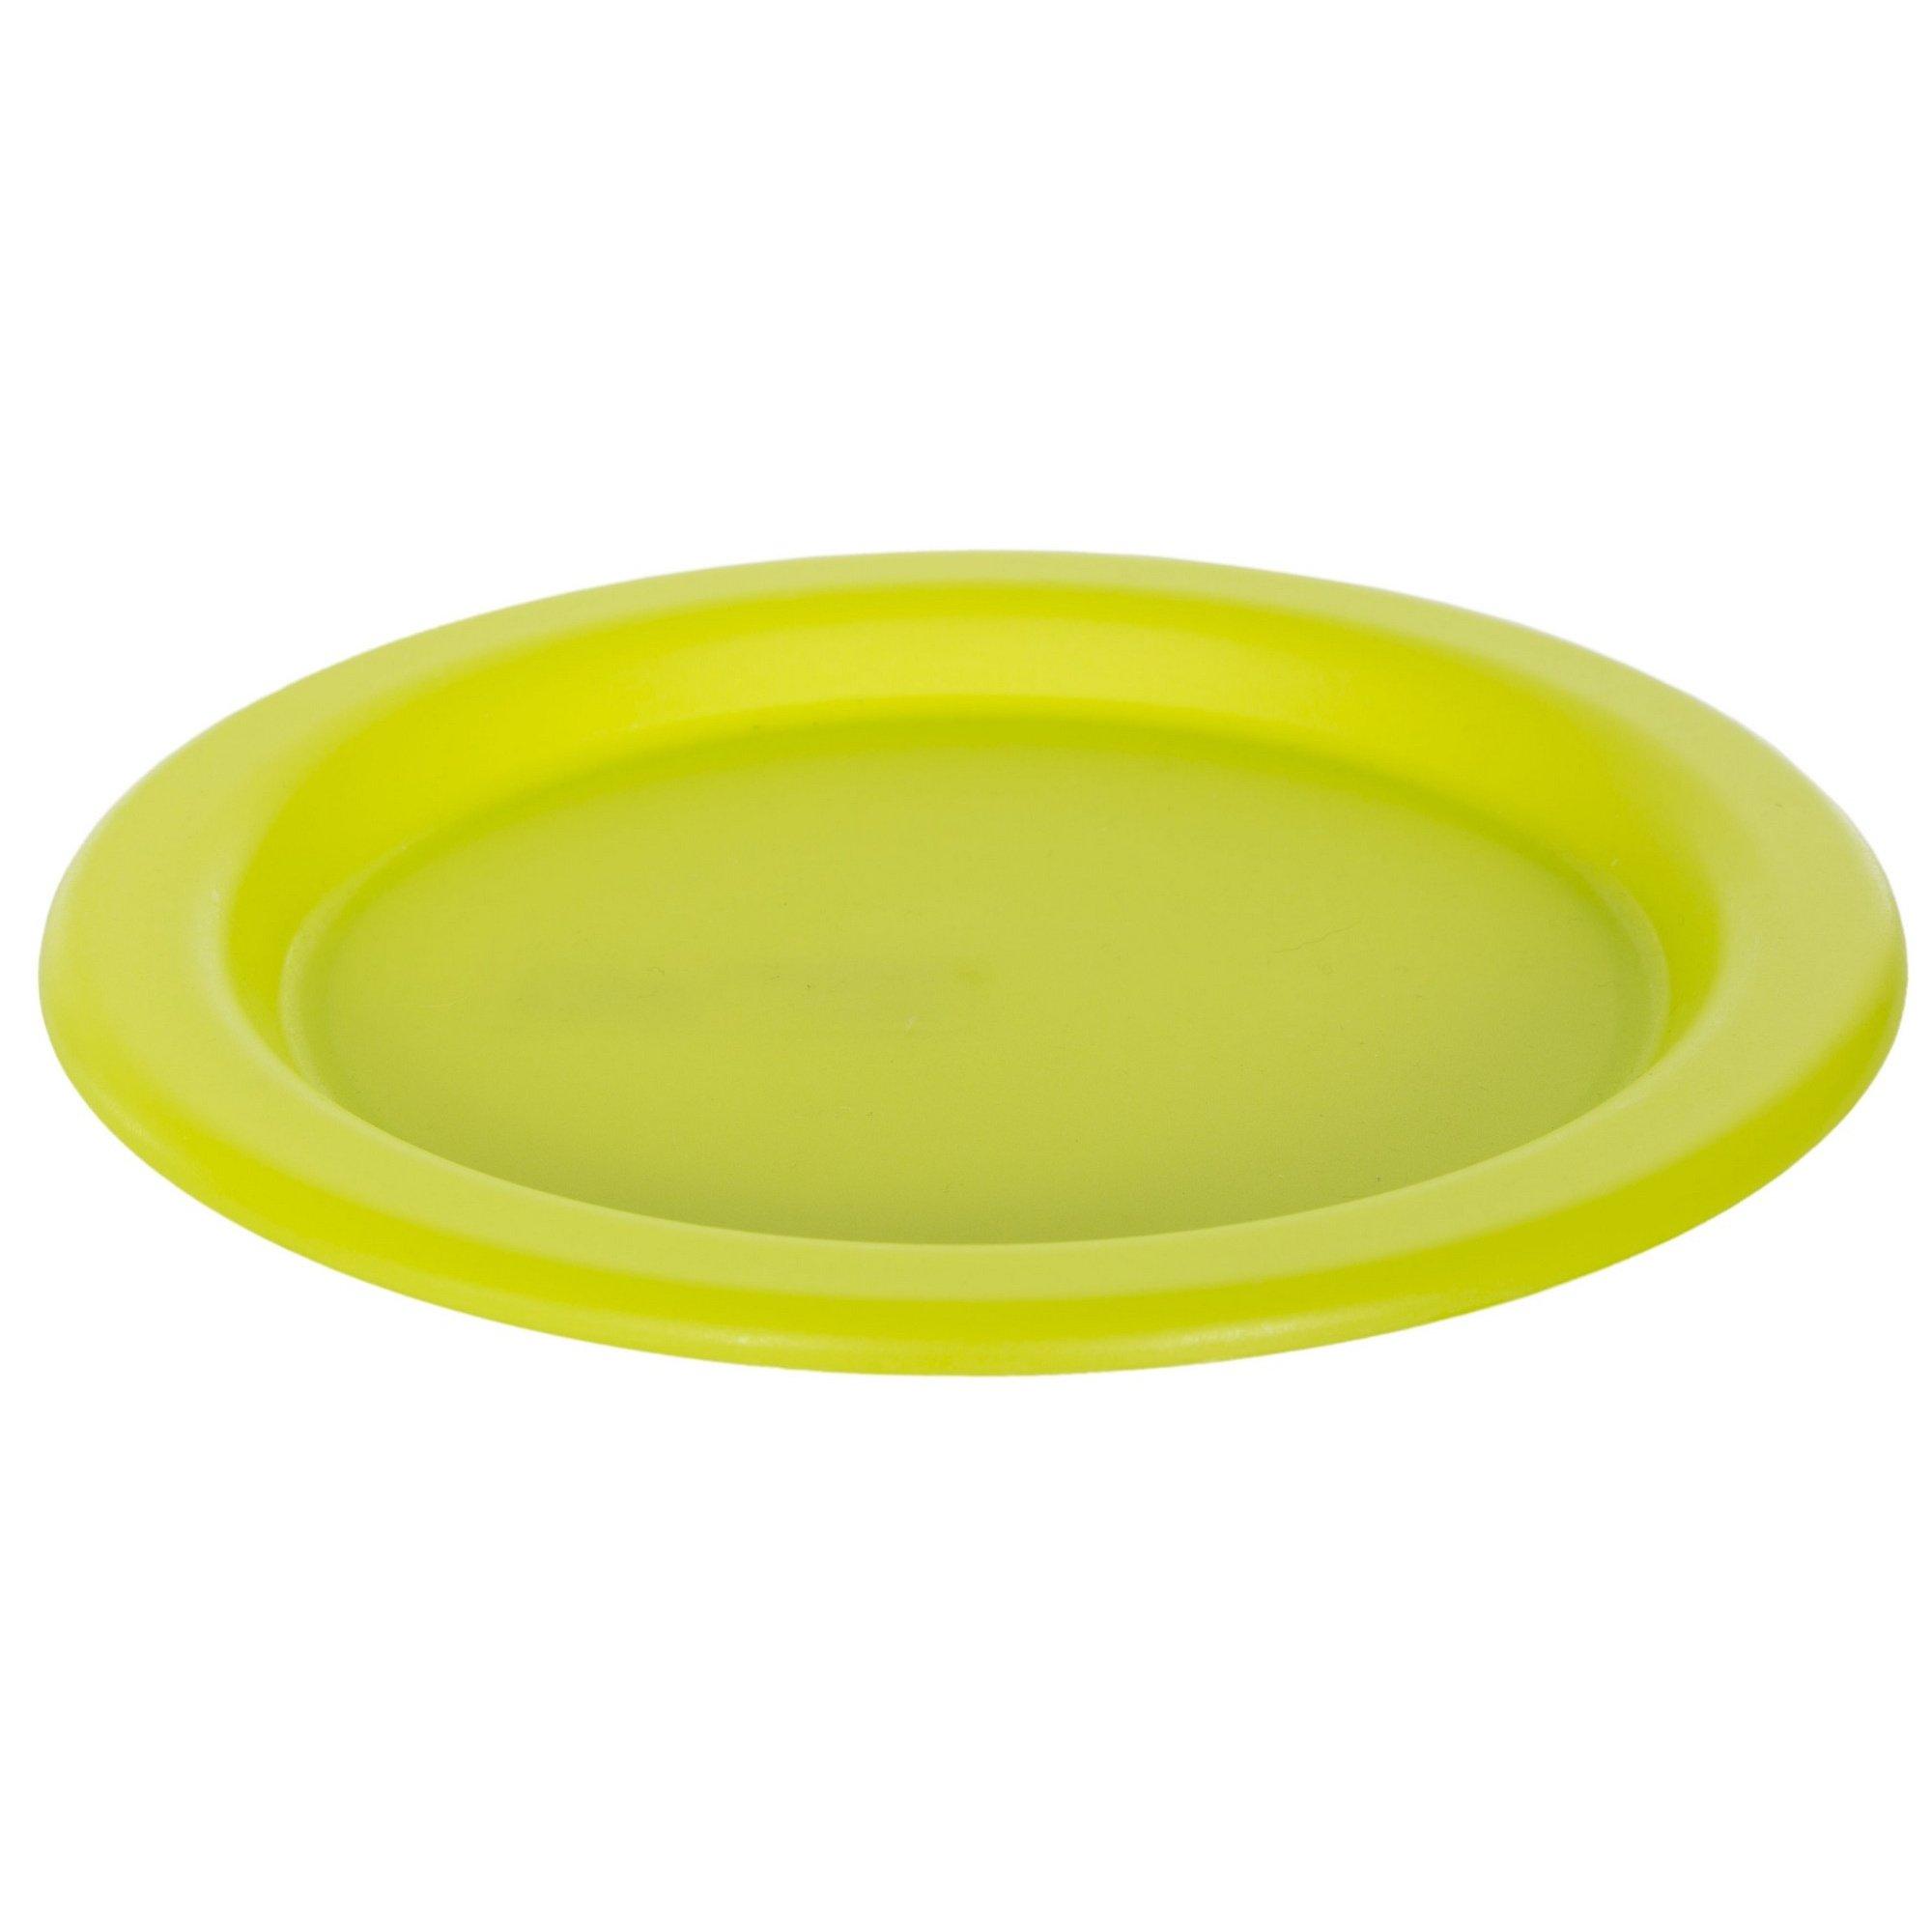 Trespass Savour Lightweight Picnic Plate (One Size) (Lime Green)